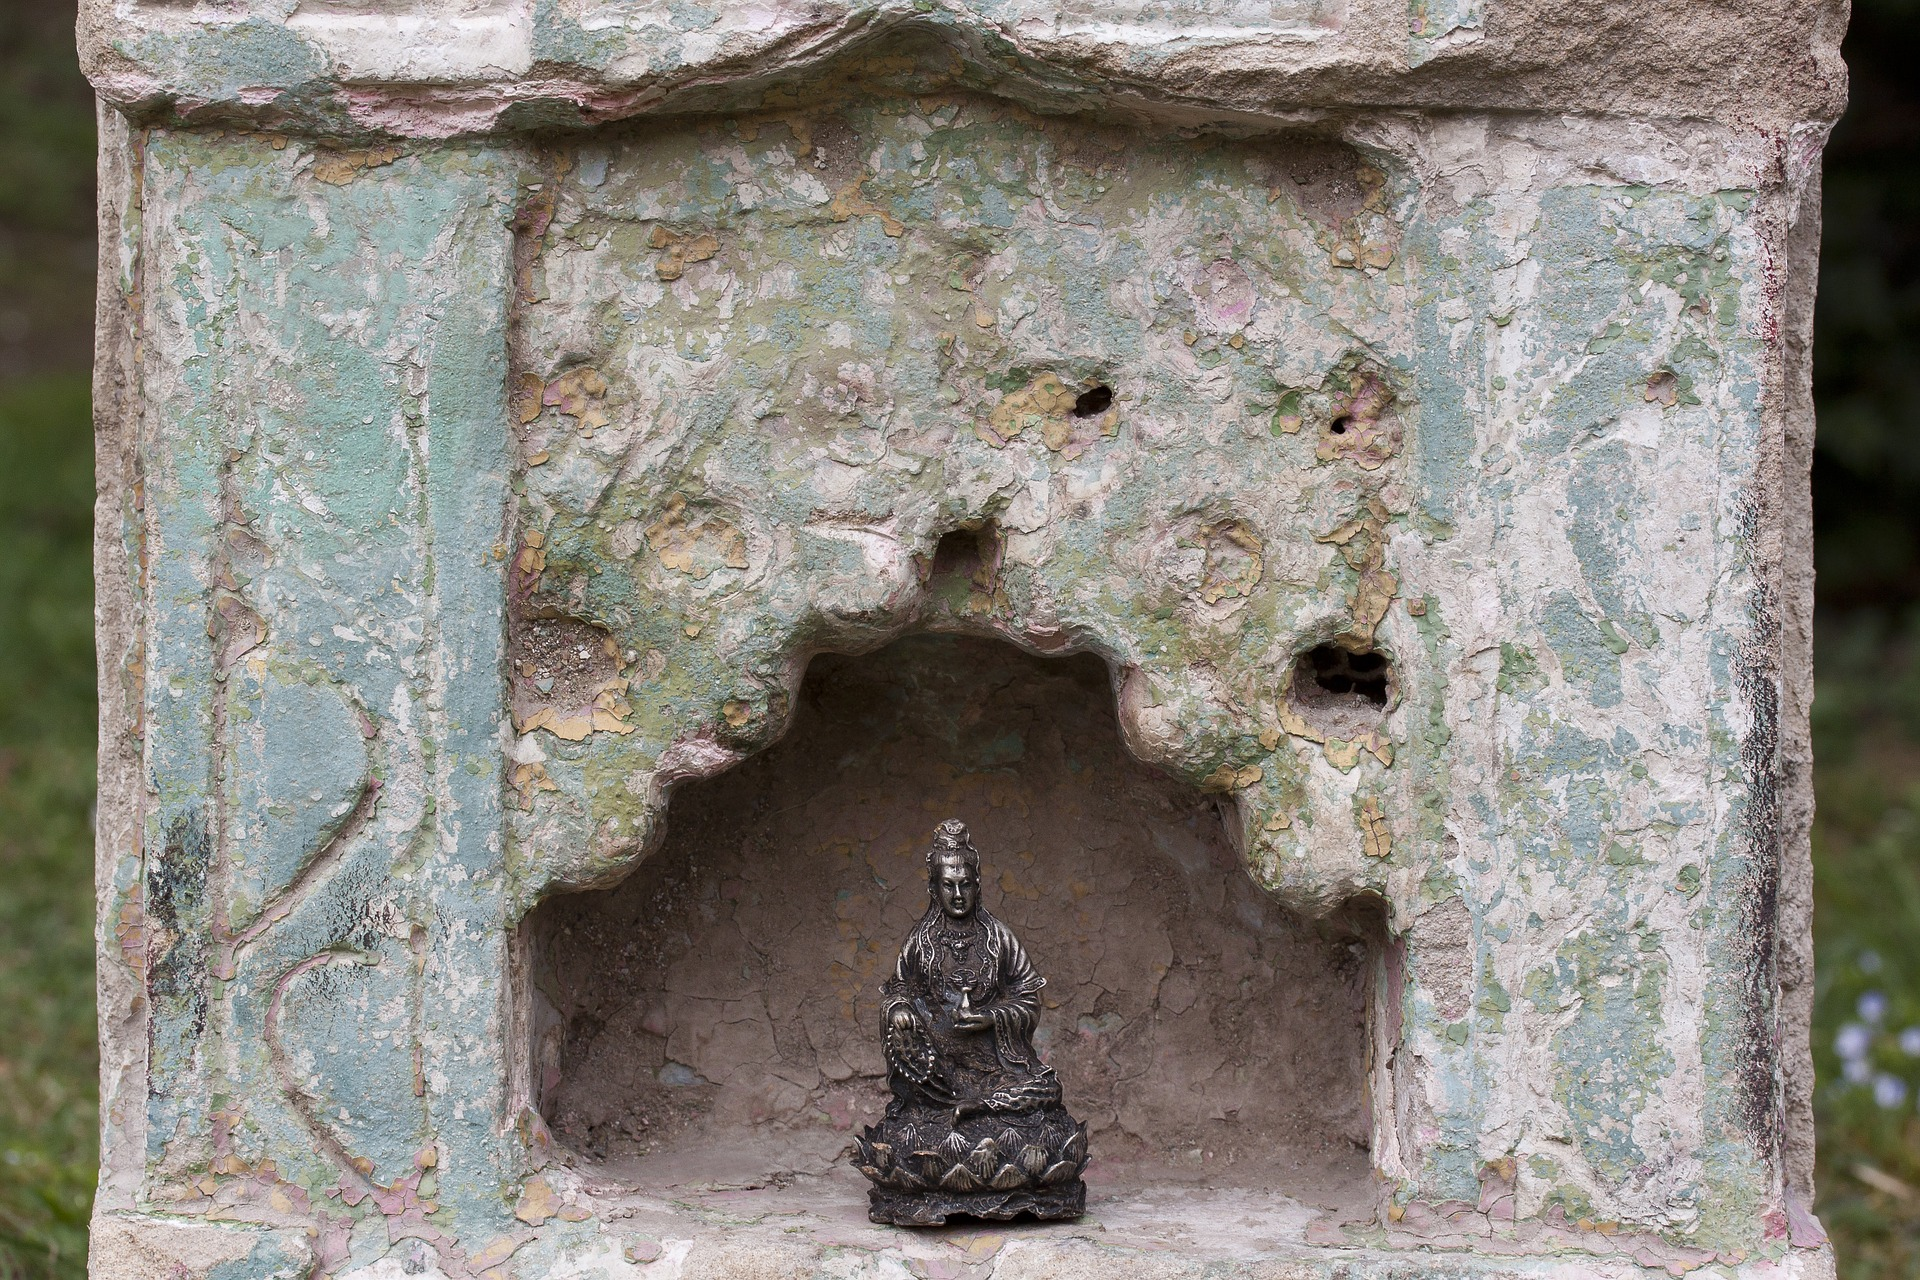 Altar, Buddha, Figure, Object, Religious, HQ Photo